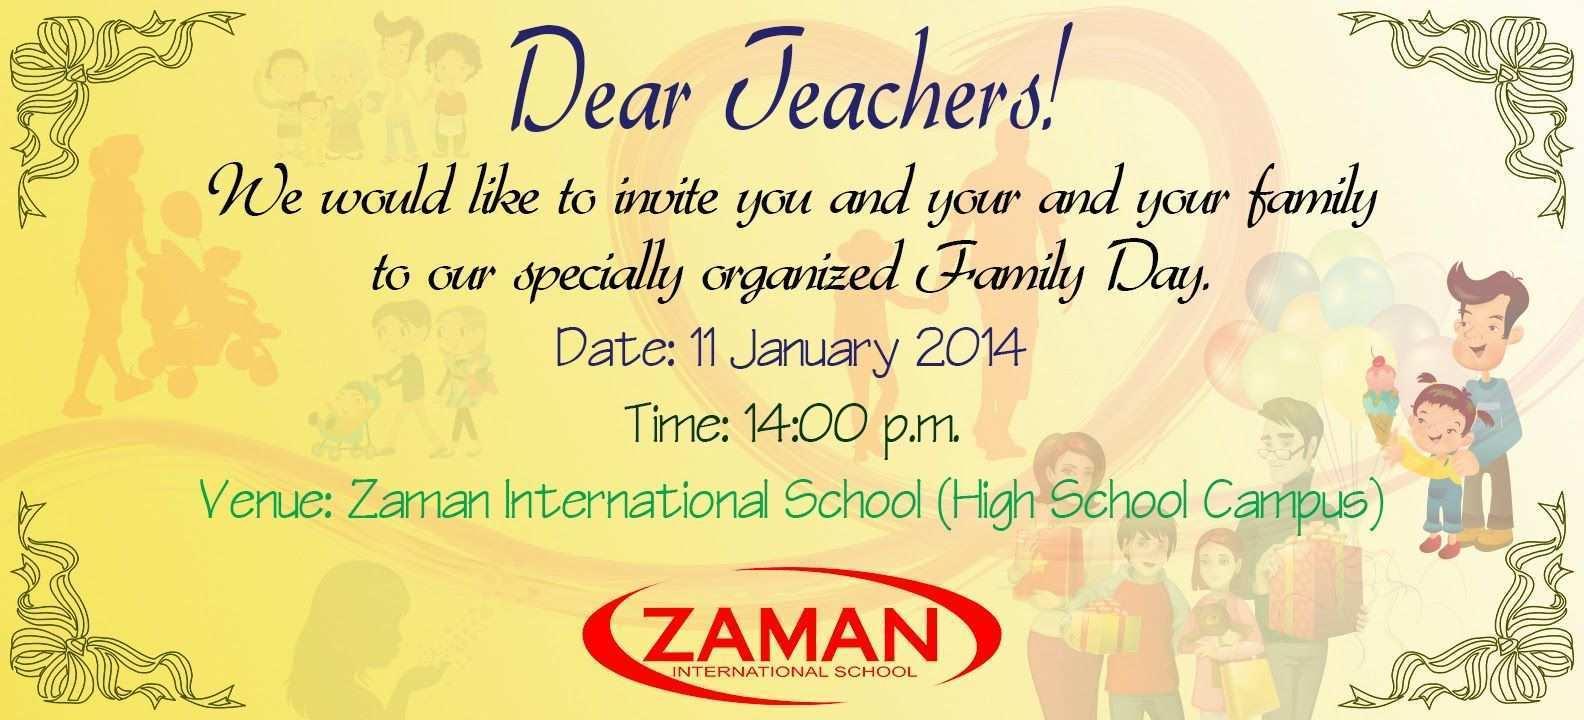 75 Format Invitation Card Sample For Teachers Day With Stunning Design by Invitation  Card Sample For Teachers Day - Cards Design Templates